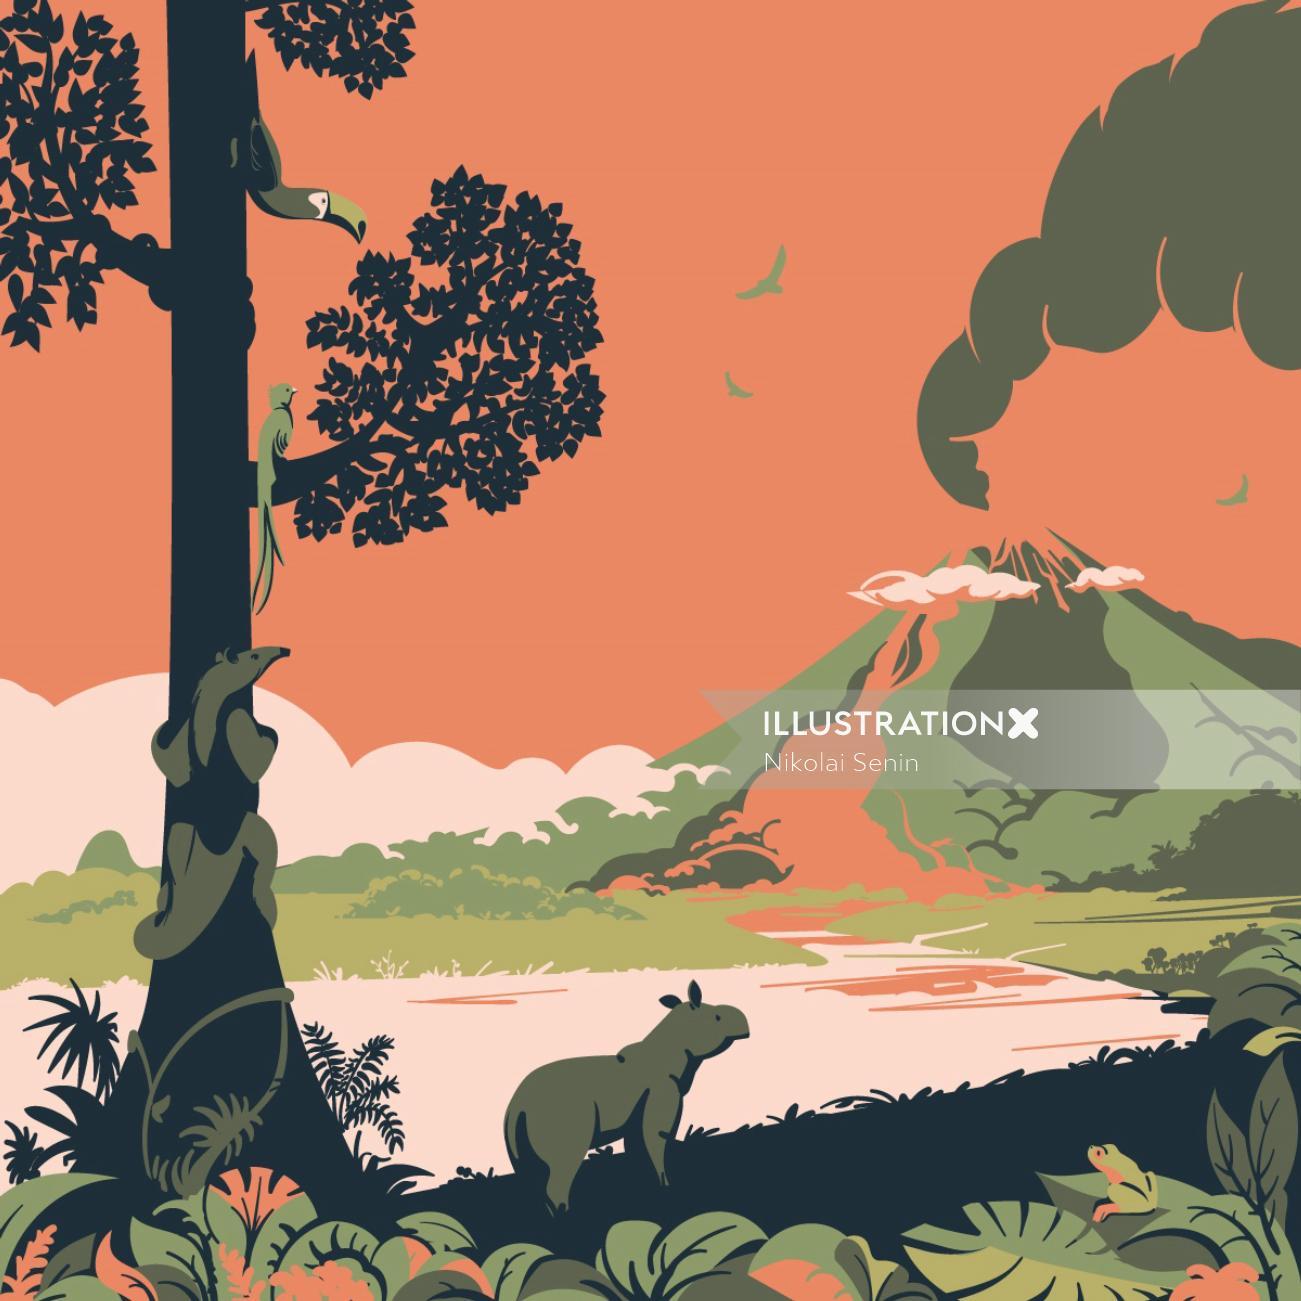 Costa Rica Arenal Volcano Illustration By Nikolai Senin